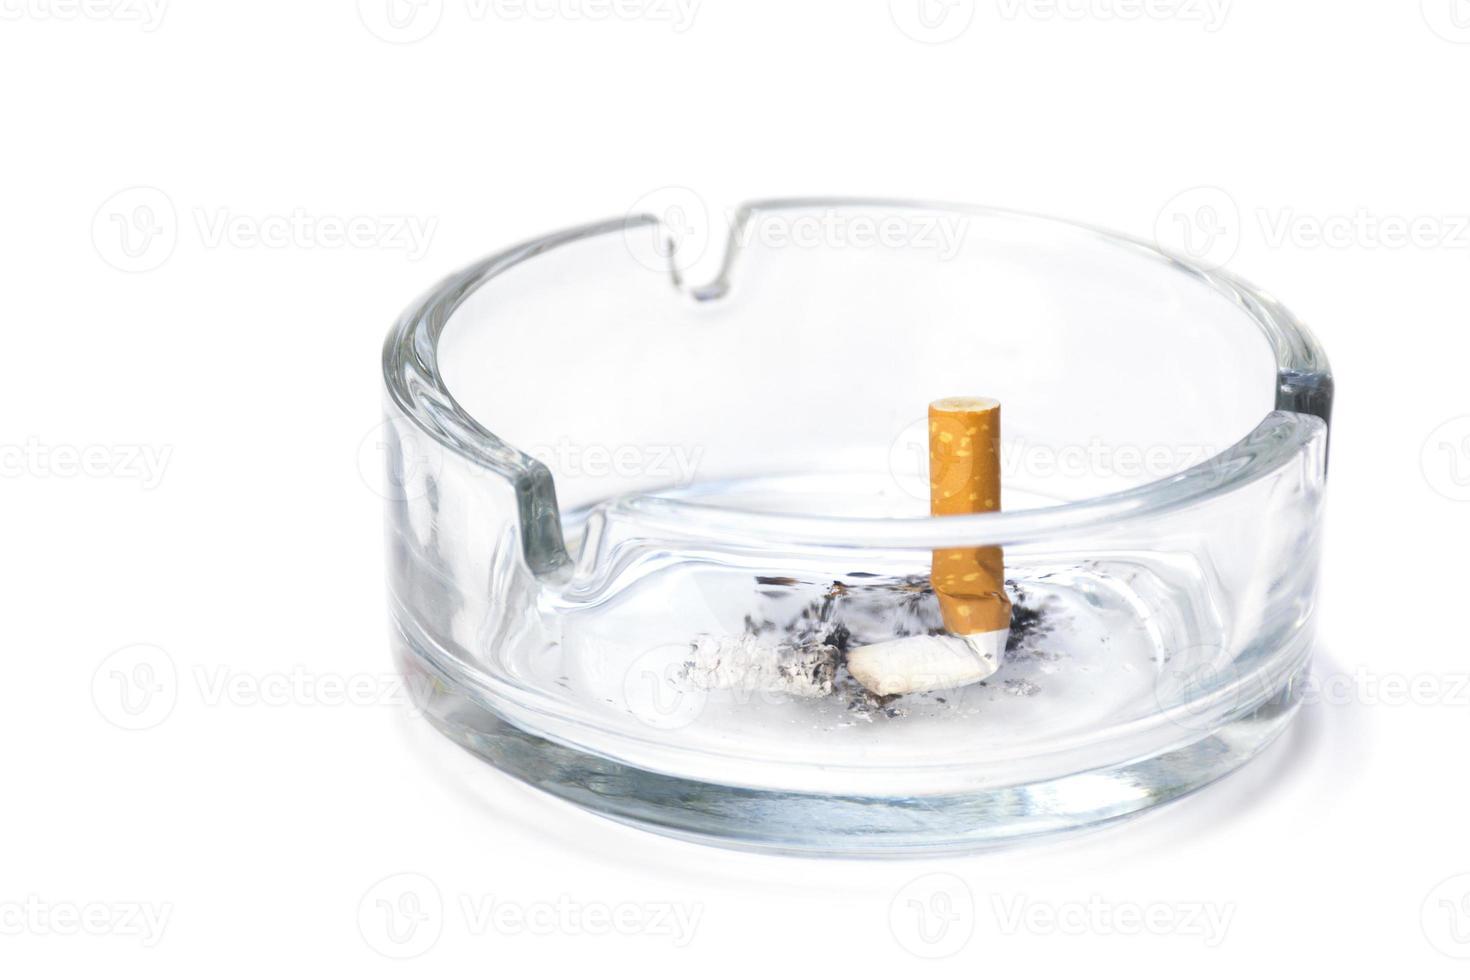 sigarettenpeuk in een asbak, geïsoleerd op wit foto